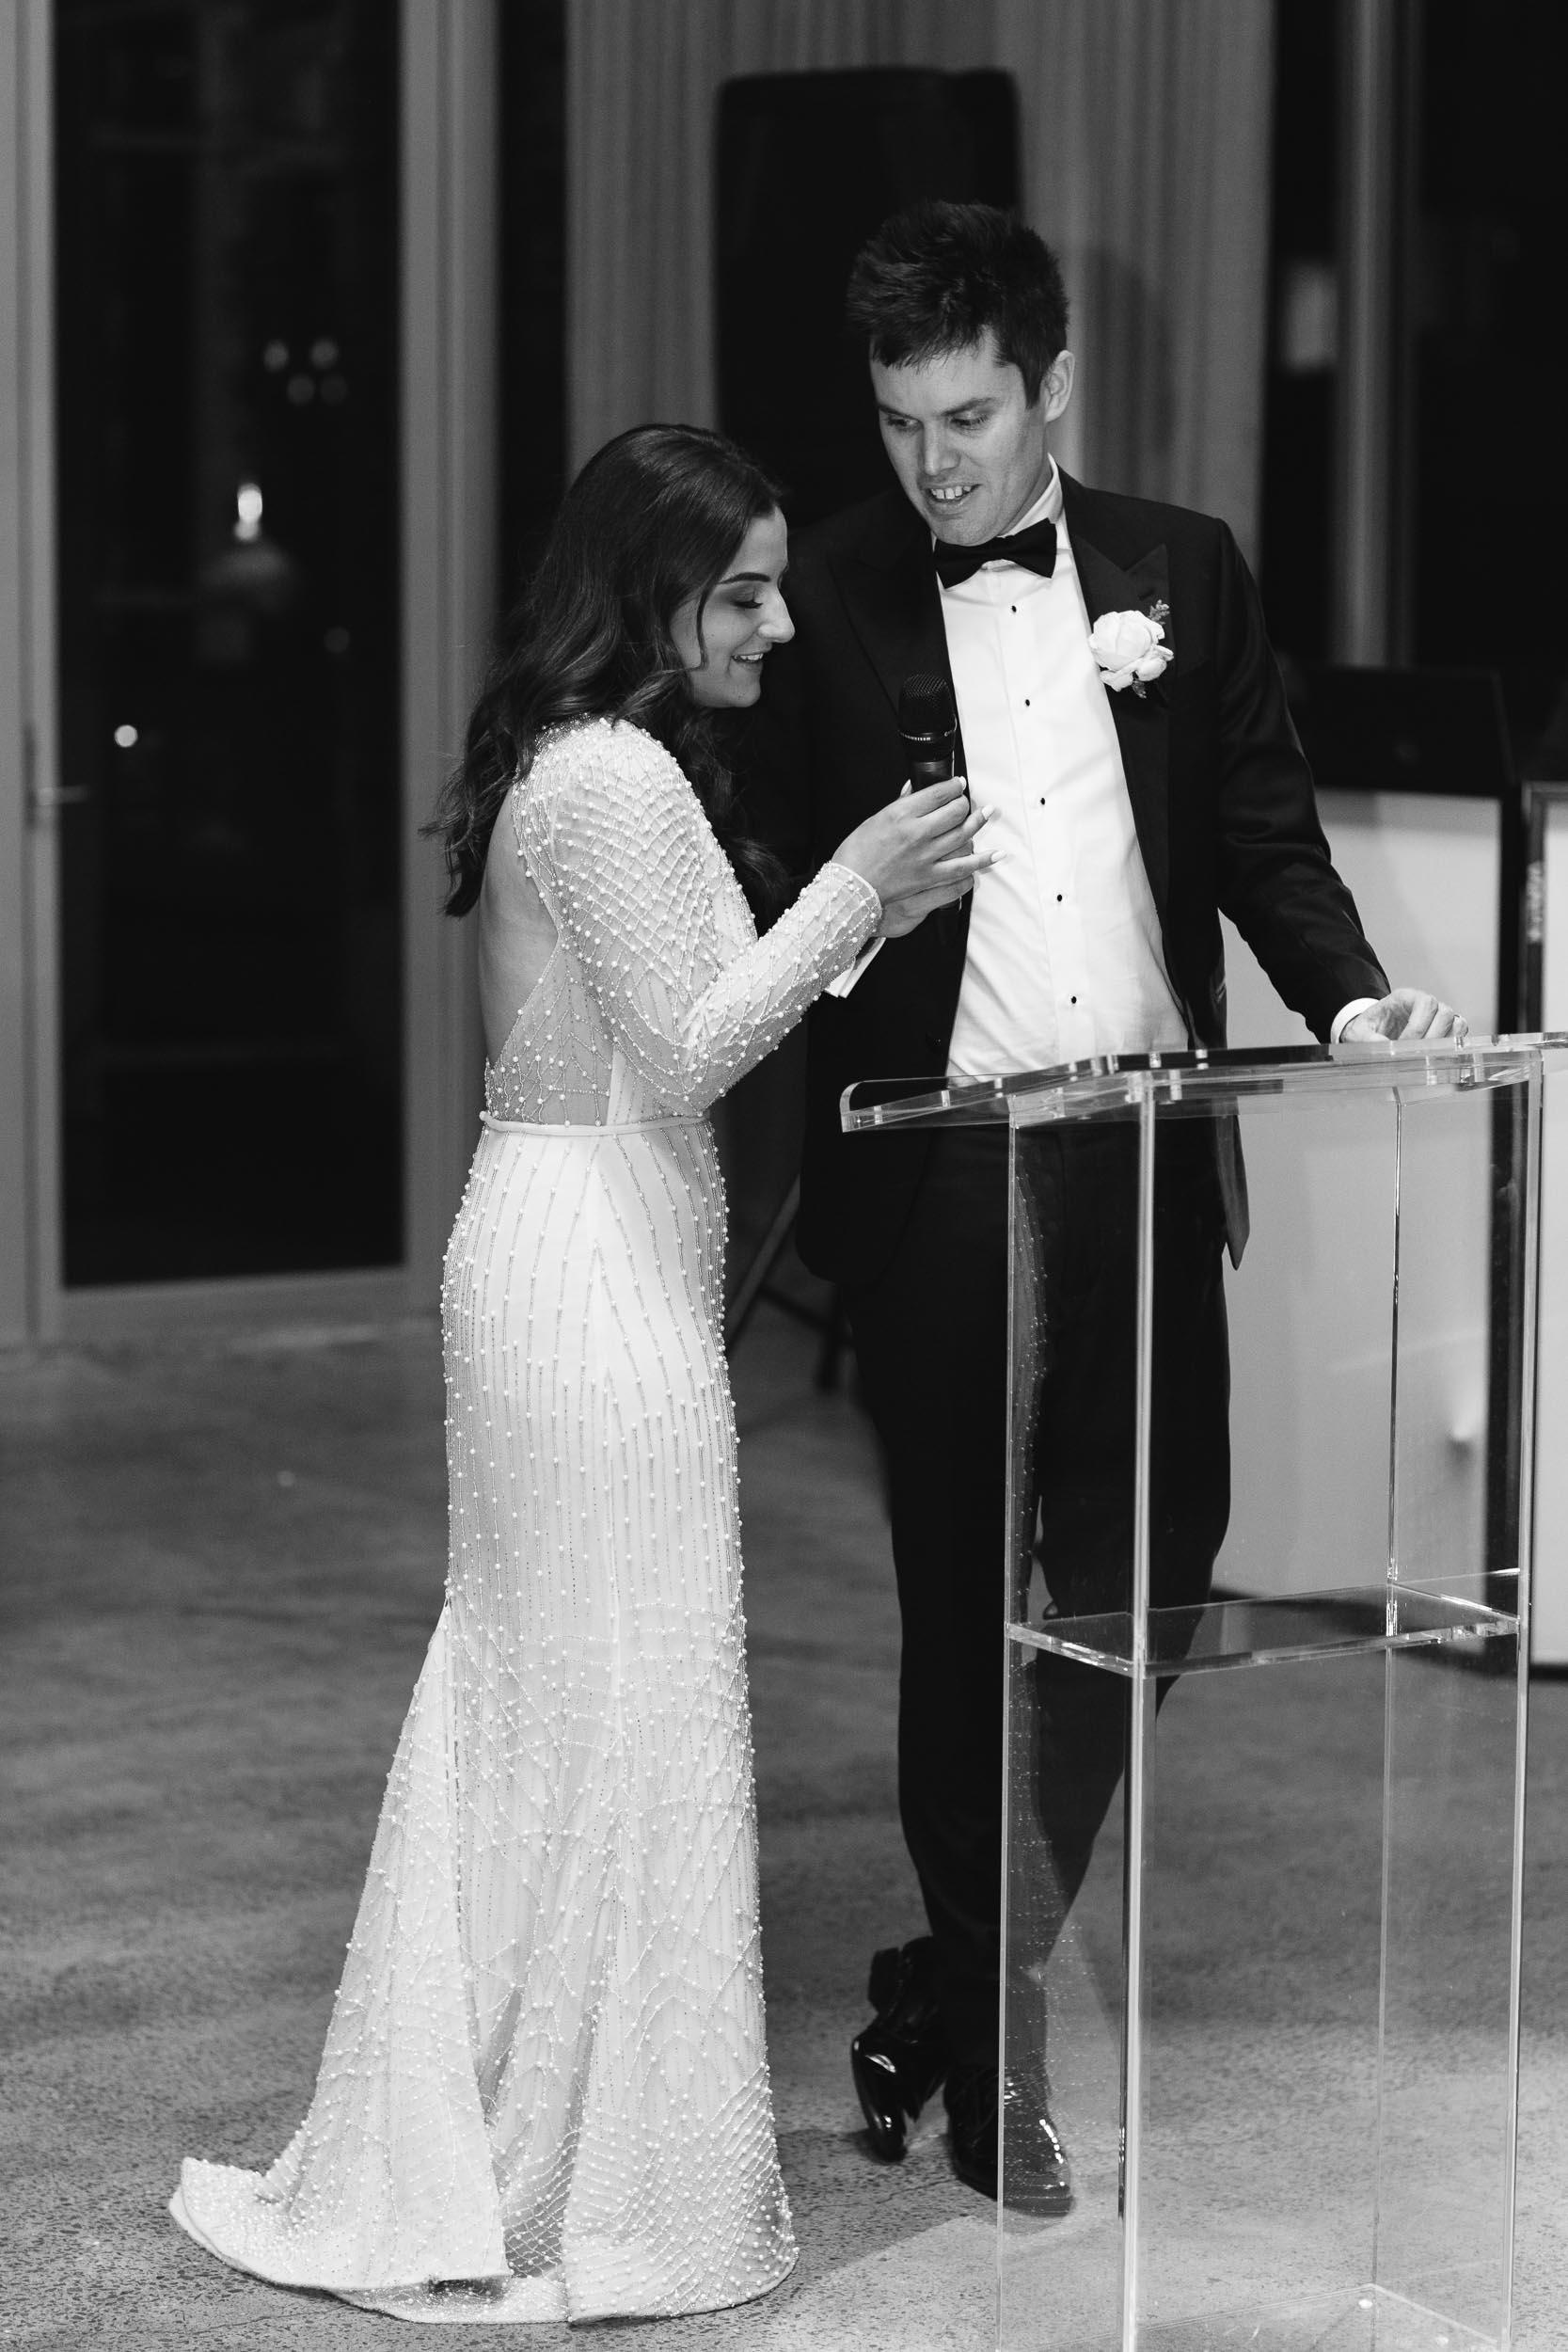 Kas-Richards-Wedding-Photographer-Melbourne-City-Wedding-Alto-Event-Space-Jane-Hill-Bridal-Gown-67.jpg